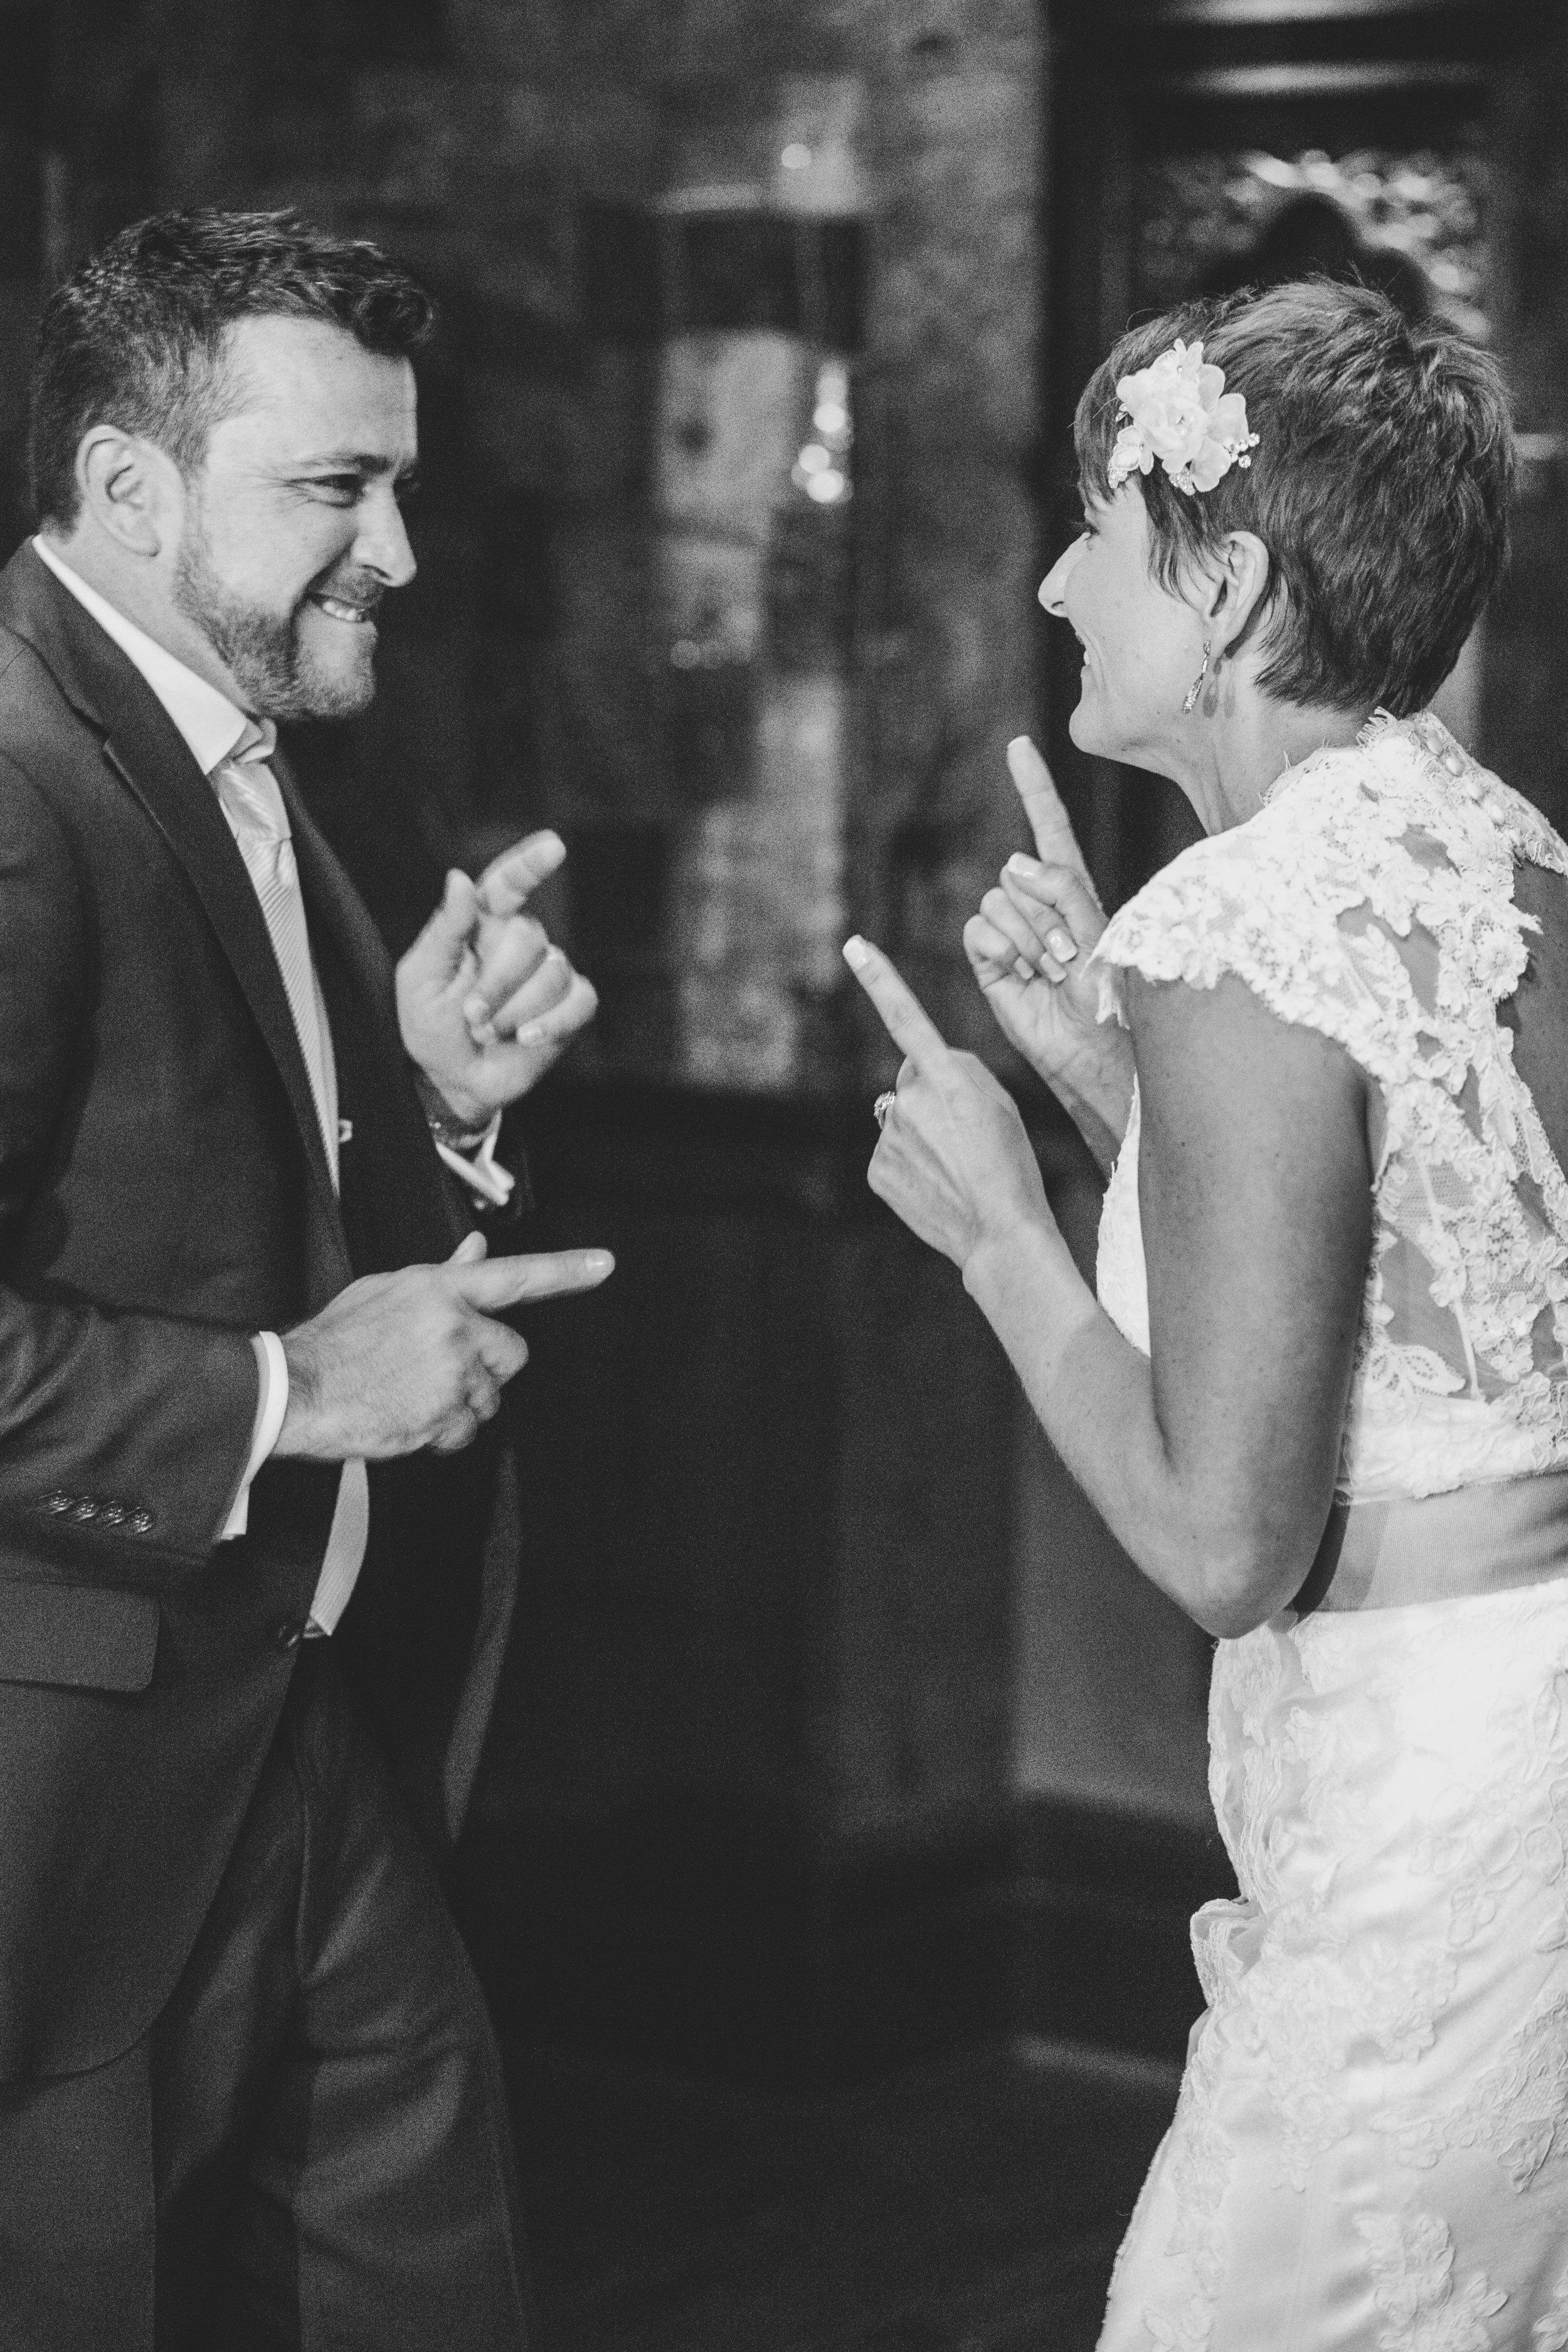 ATGI_Kat and Gabe Wedding 2016_2S8A5962.jpg